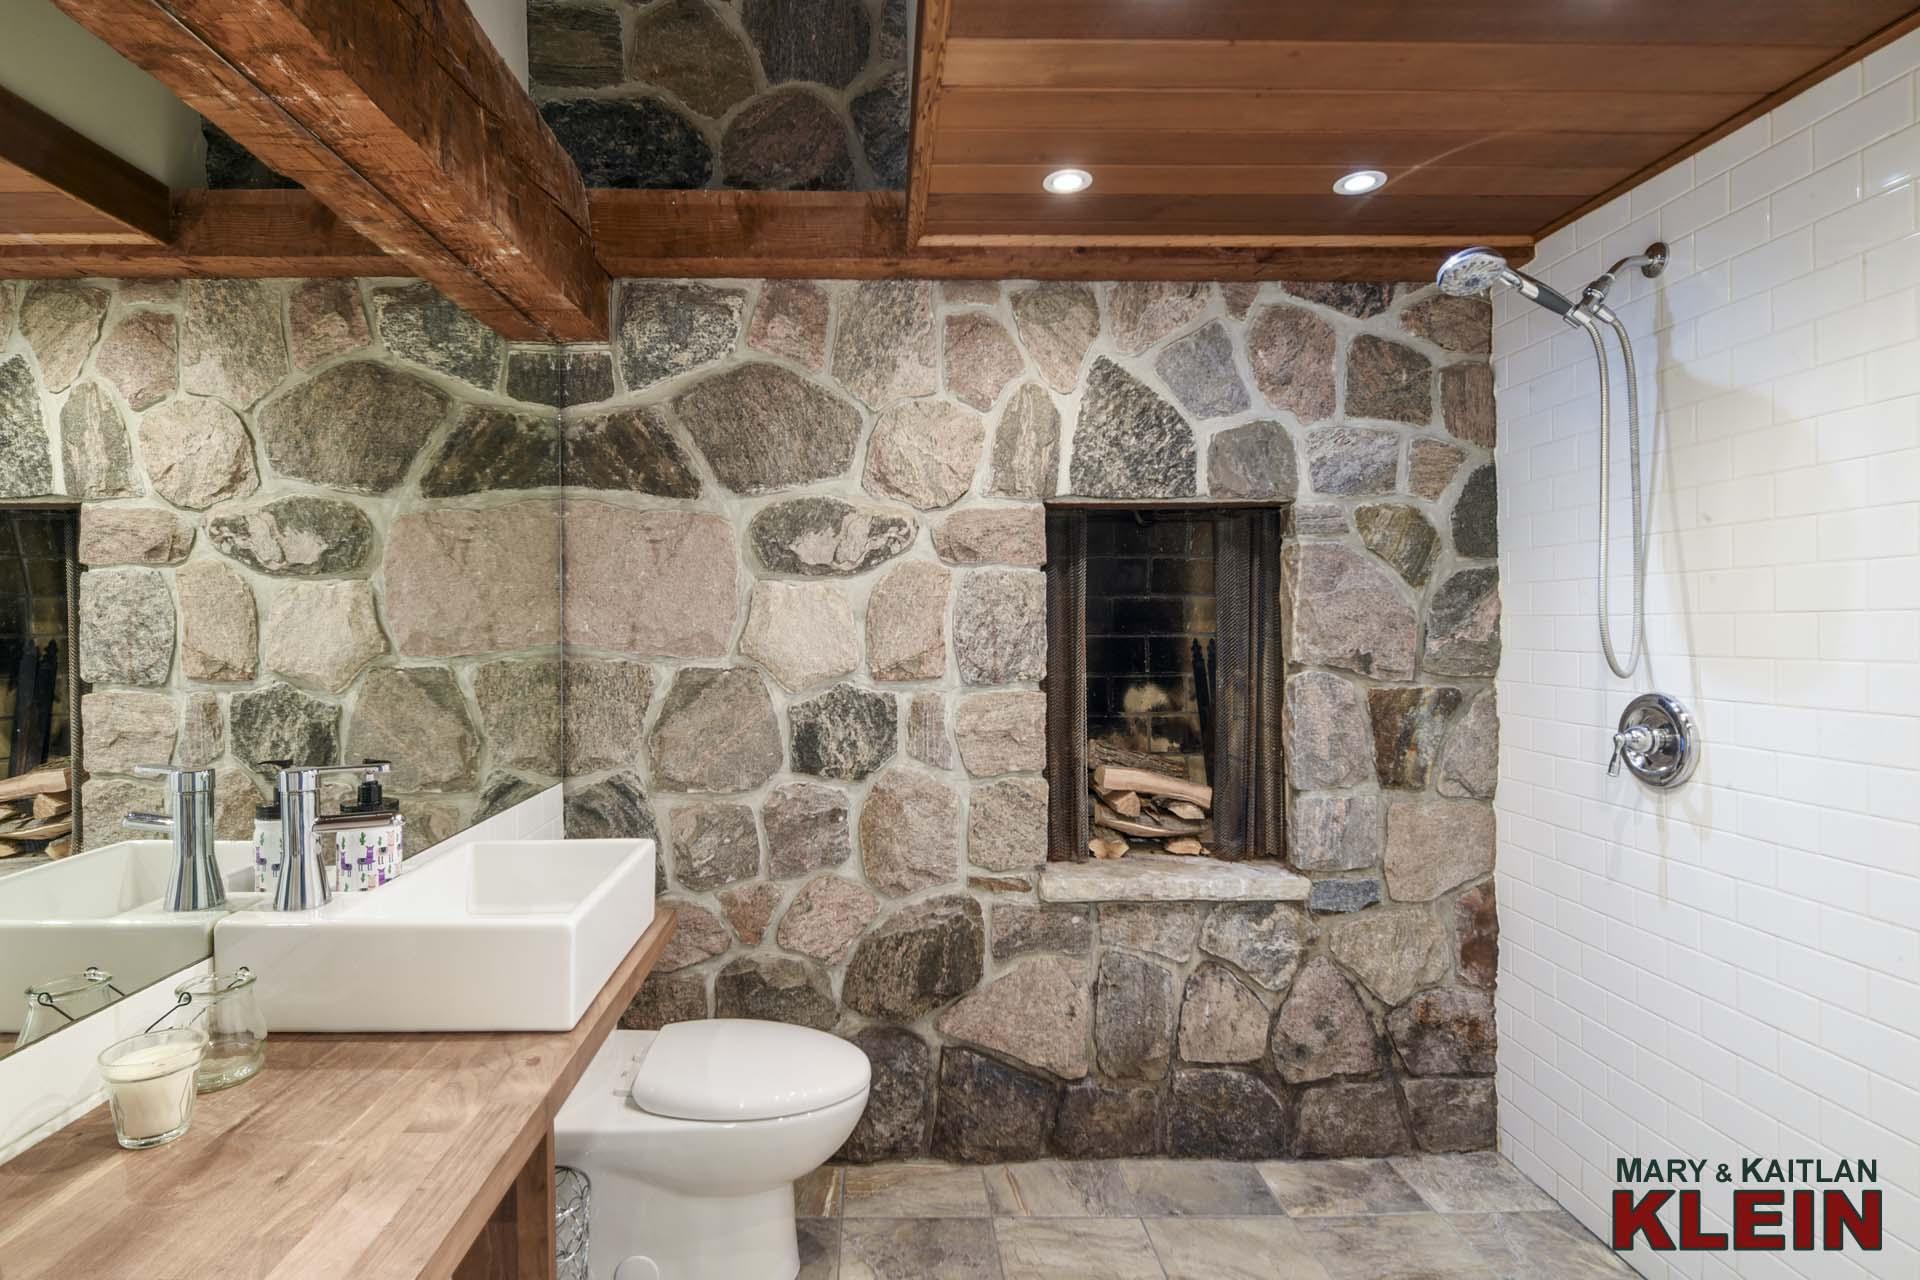 3-Piece Main Bathroom